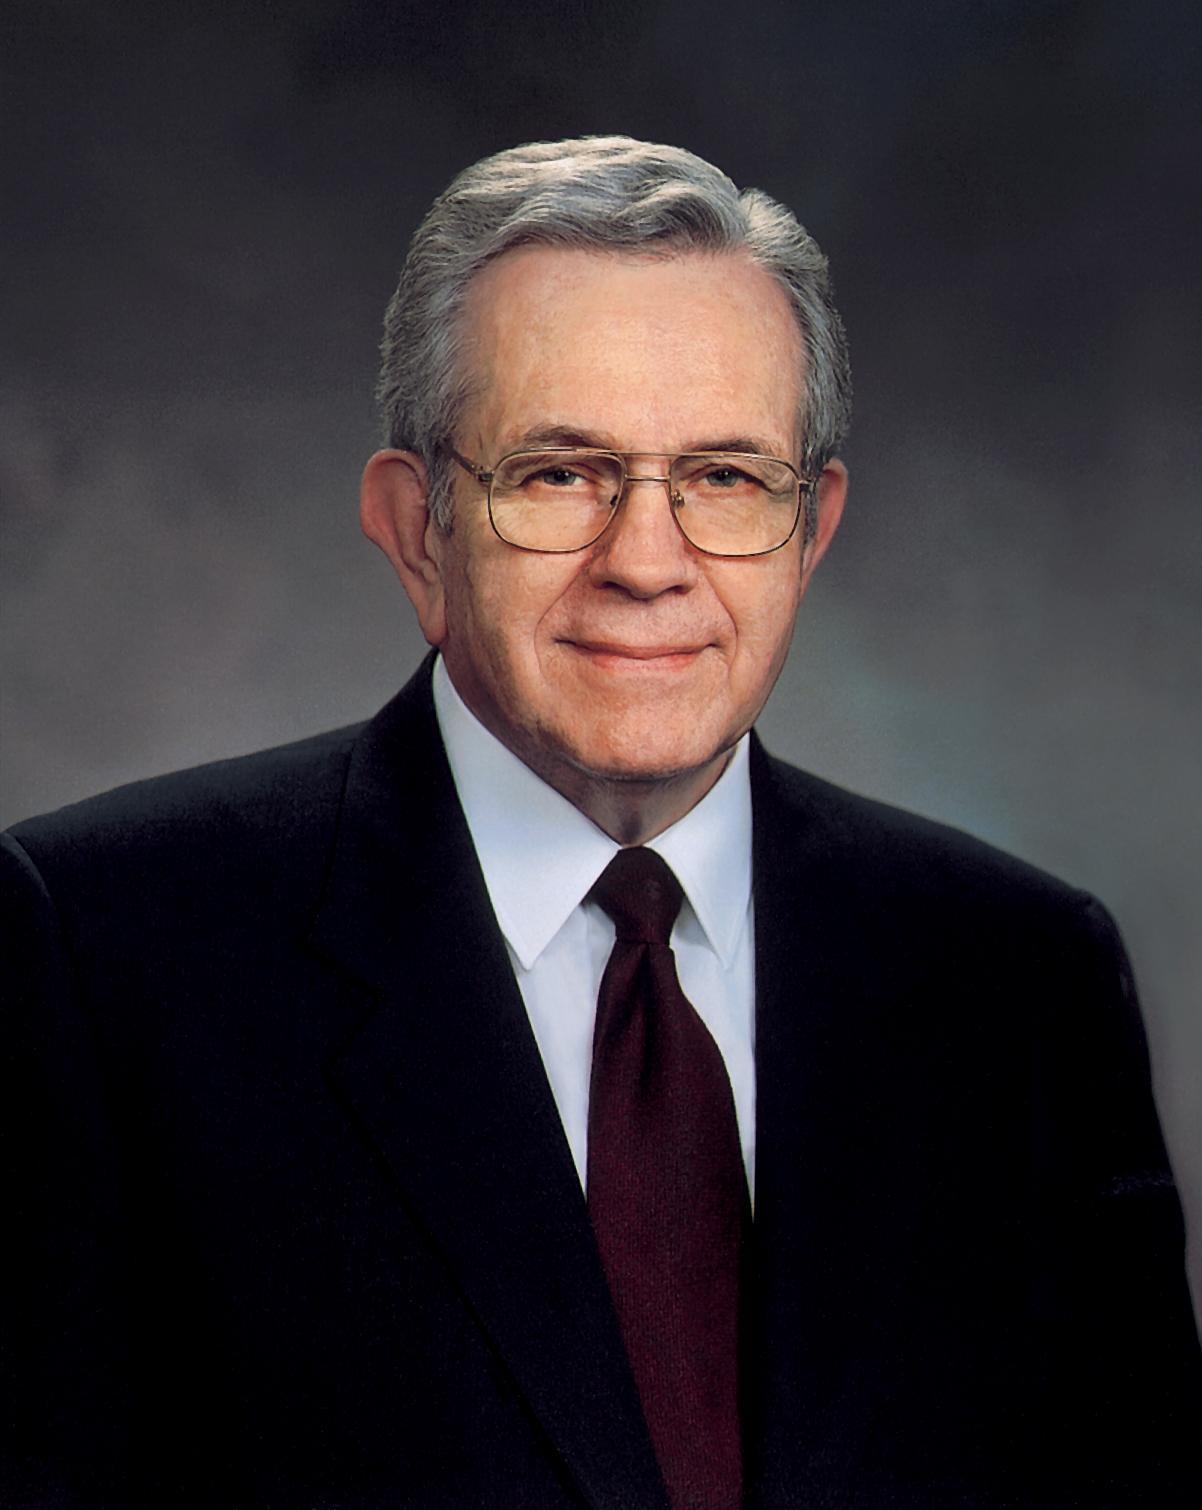 Presidente Boyd K. Packer falece aos 90 anos